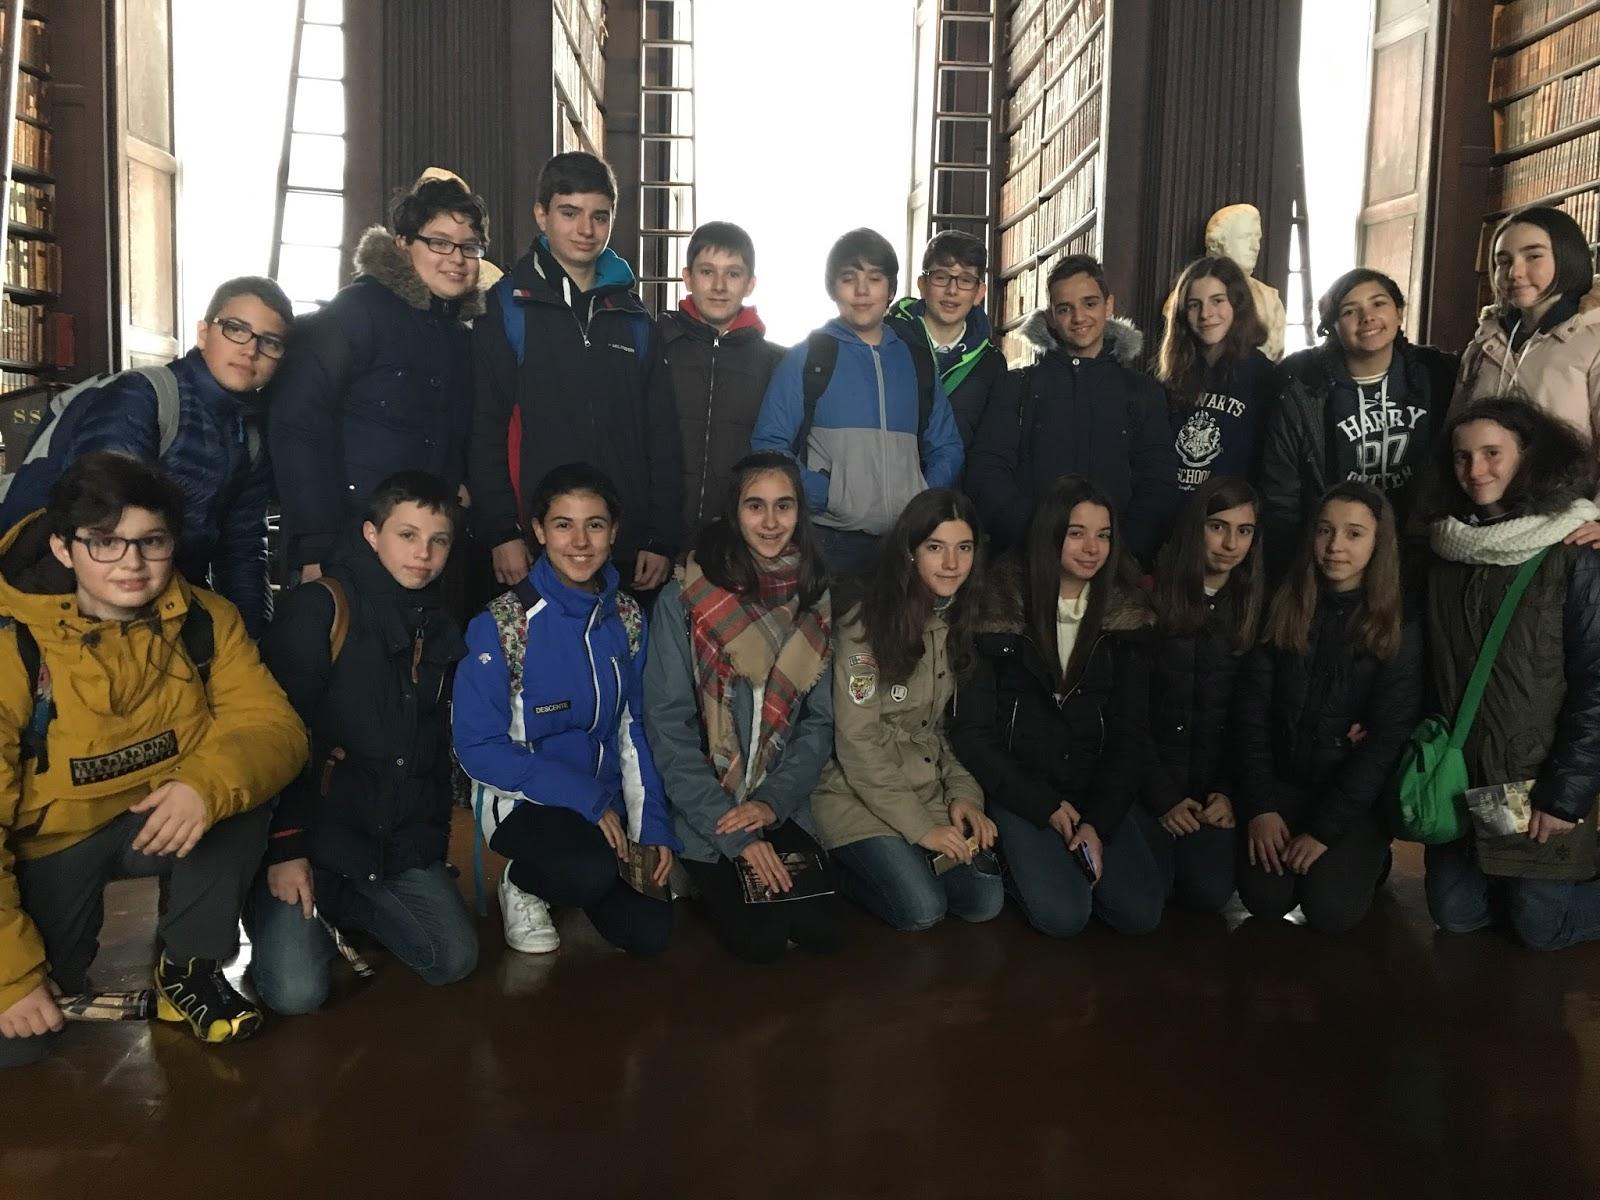 Agustinas Valladolid - 2017 - ESO 1 2 - Irlanda 4